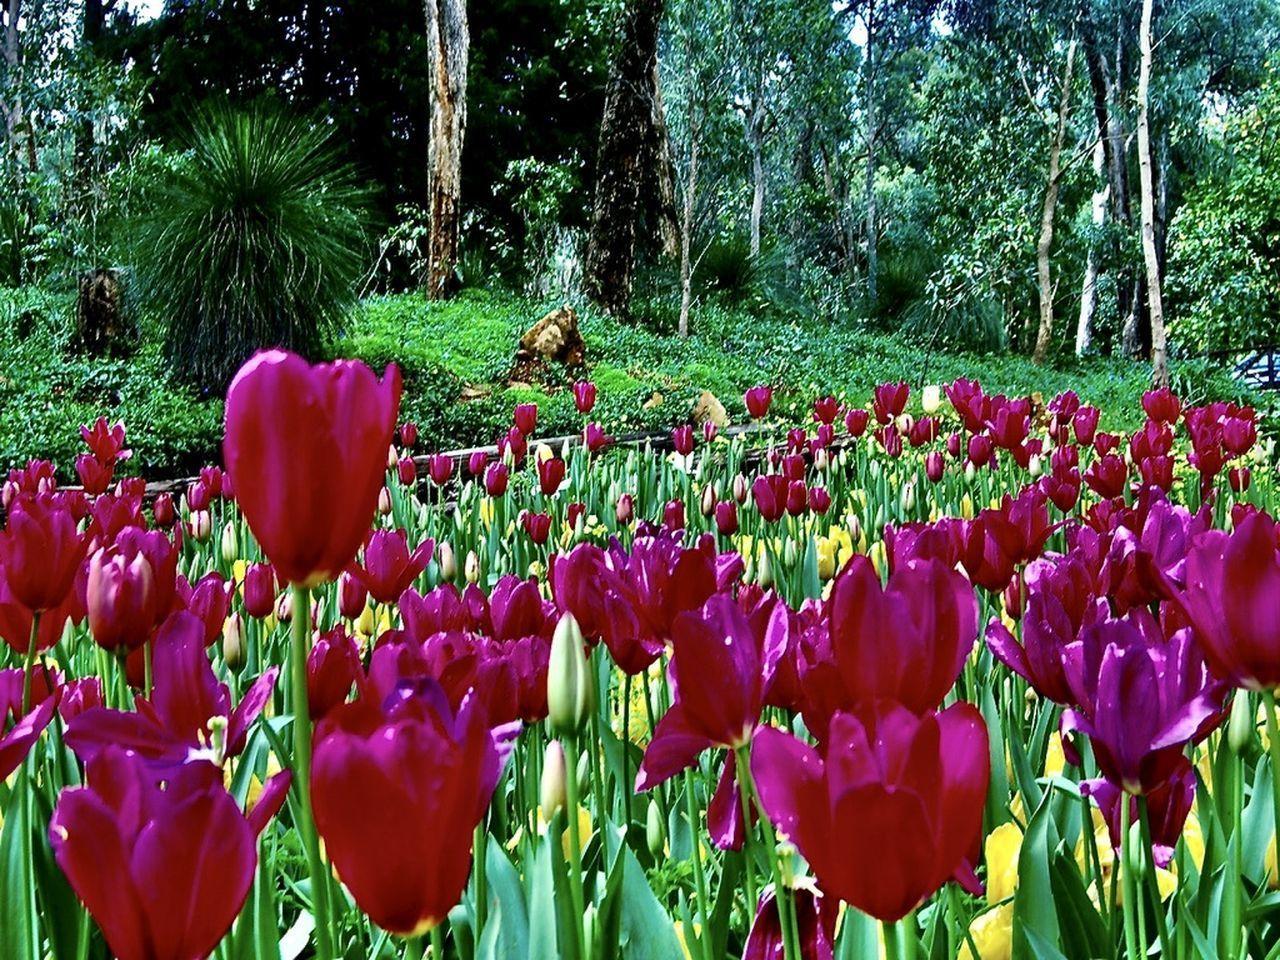 CLOSE-UP OF TULIP FLOWERS IN PARK